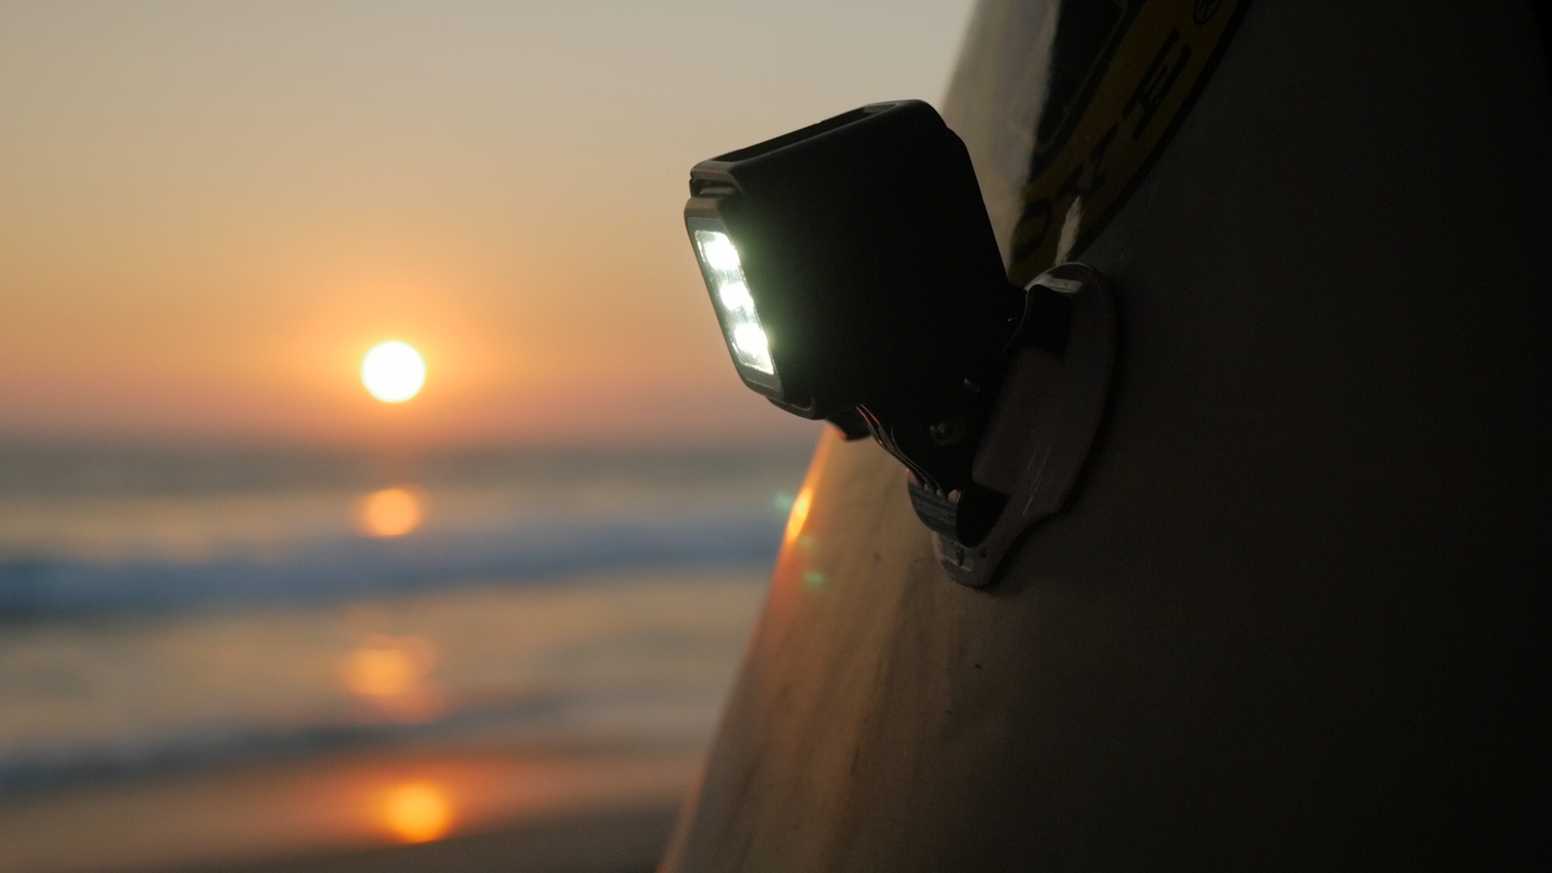 Led night light kickstarter - Litratorch World S Most Versatile Adventure Led Light For Pro Photo Video Underwater